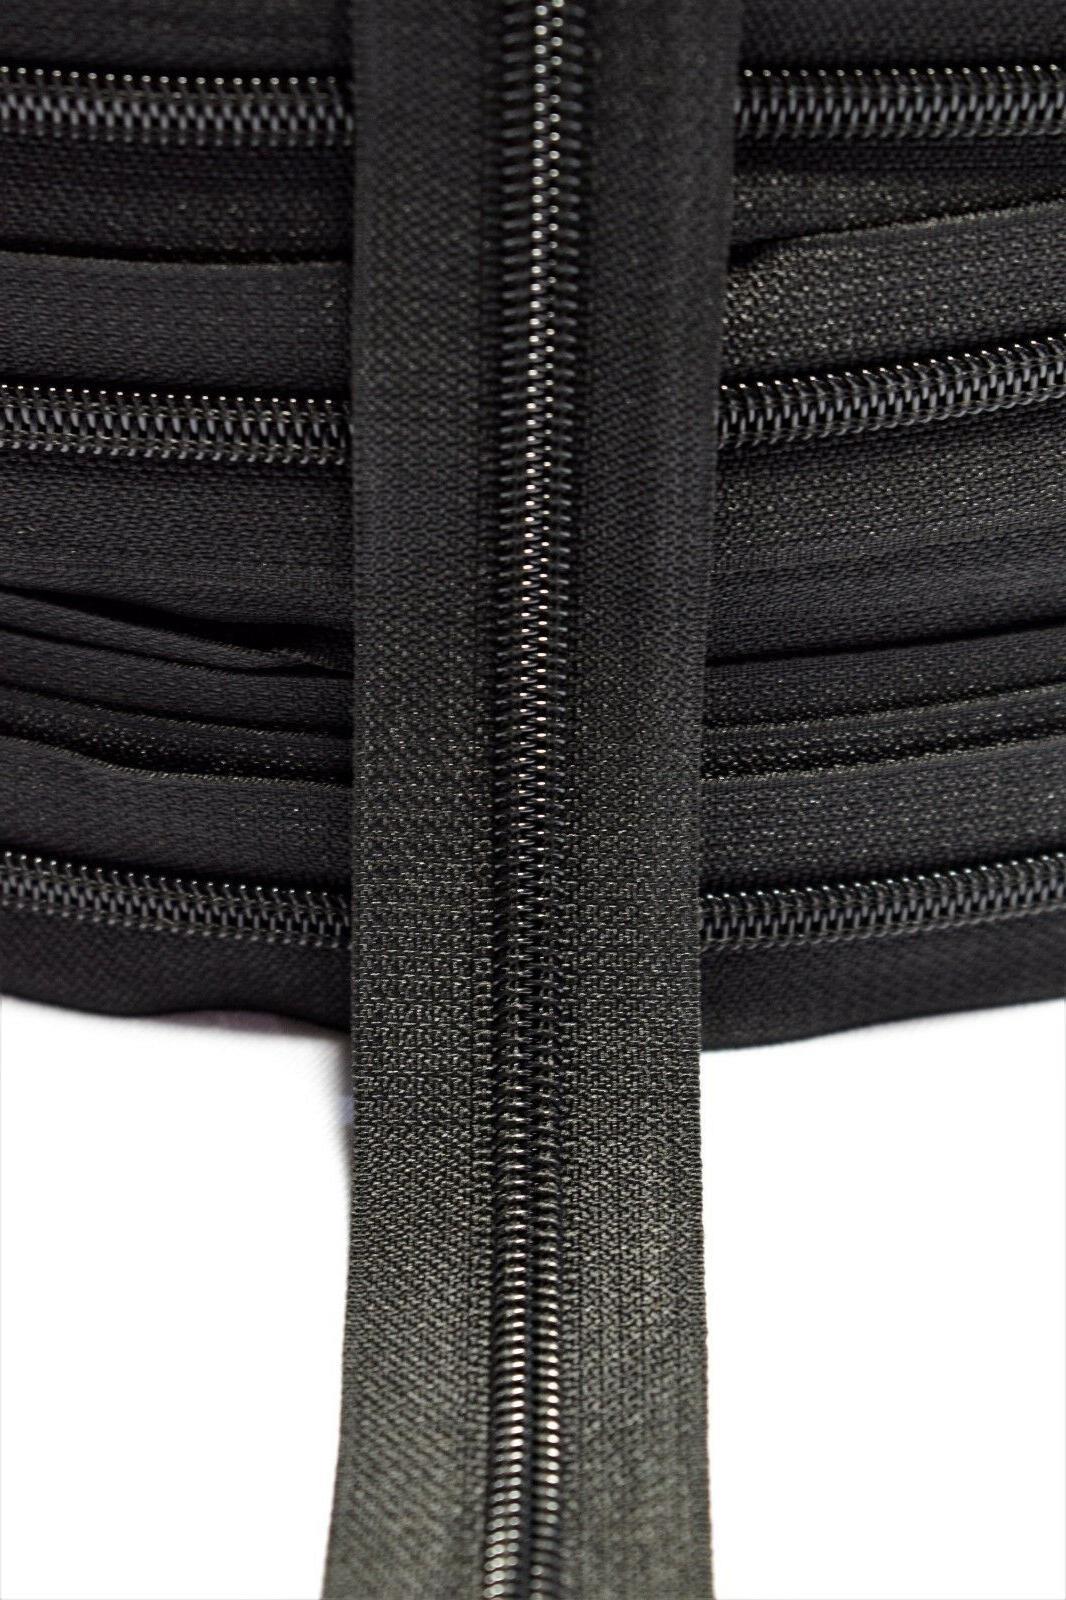 #5 Black Chain Cloth Apparel Jackets